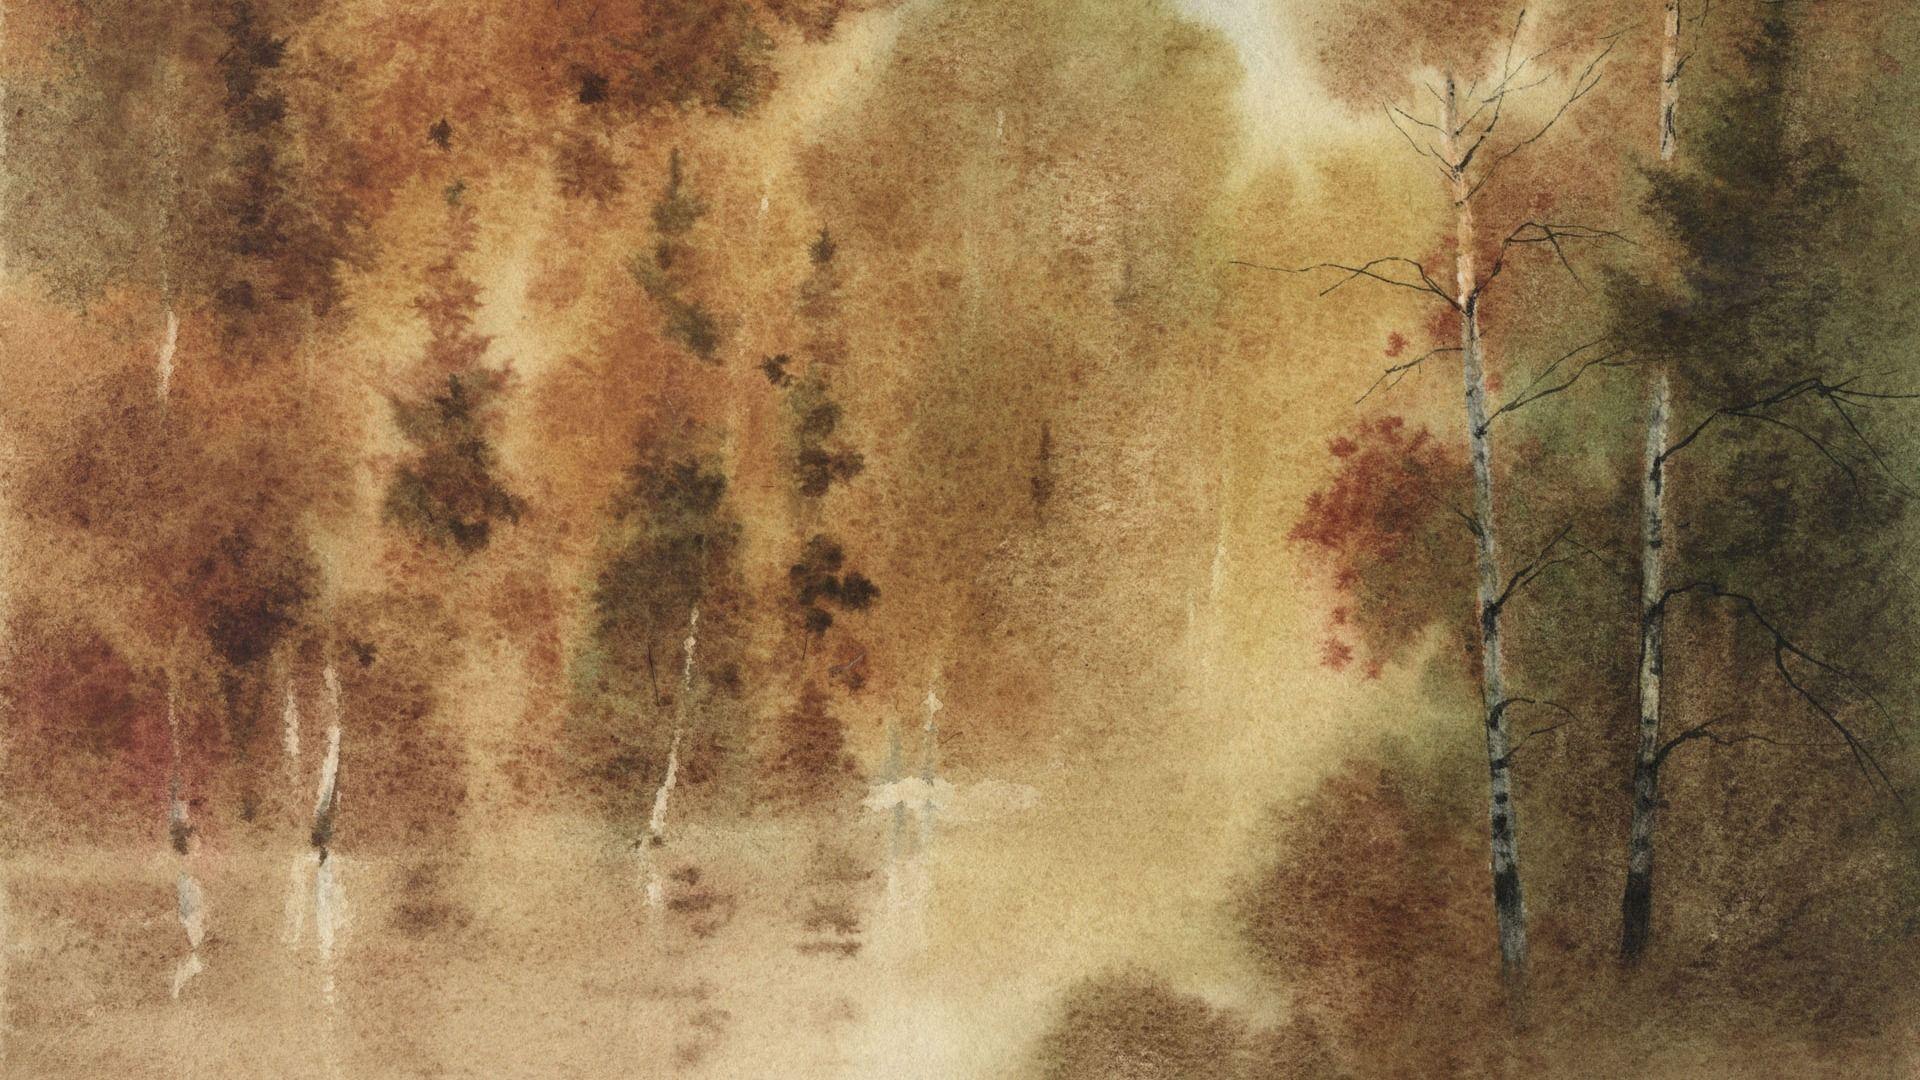 22 Beautiful Watercolor Desktop Wallpaper - Hd Images First Love Quotes - HD Wallpaper